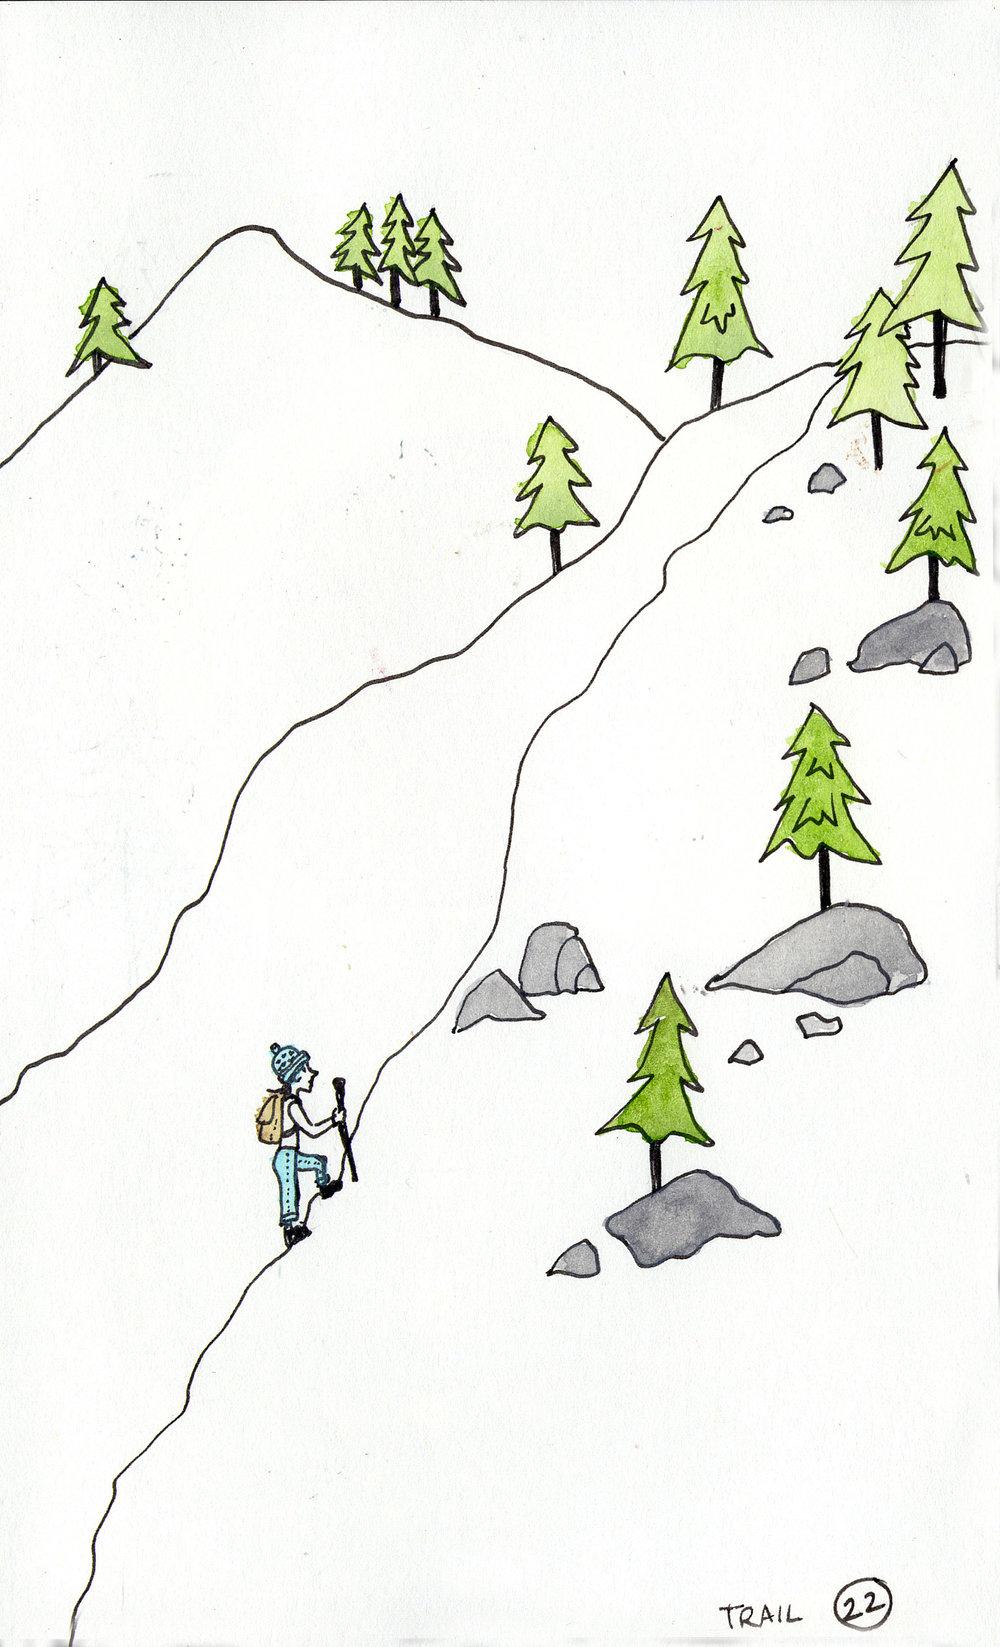 Day 22: Trail